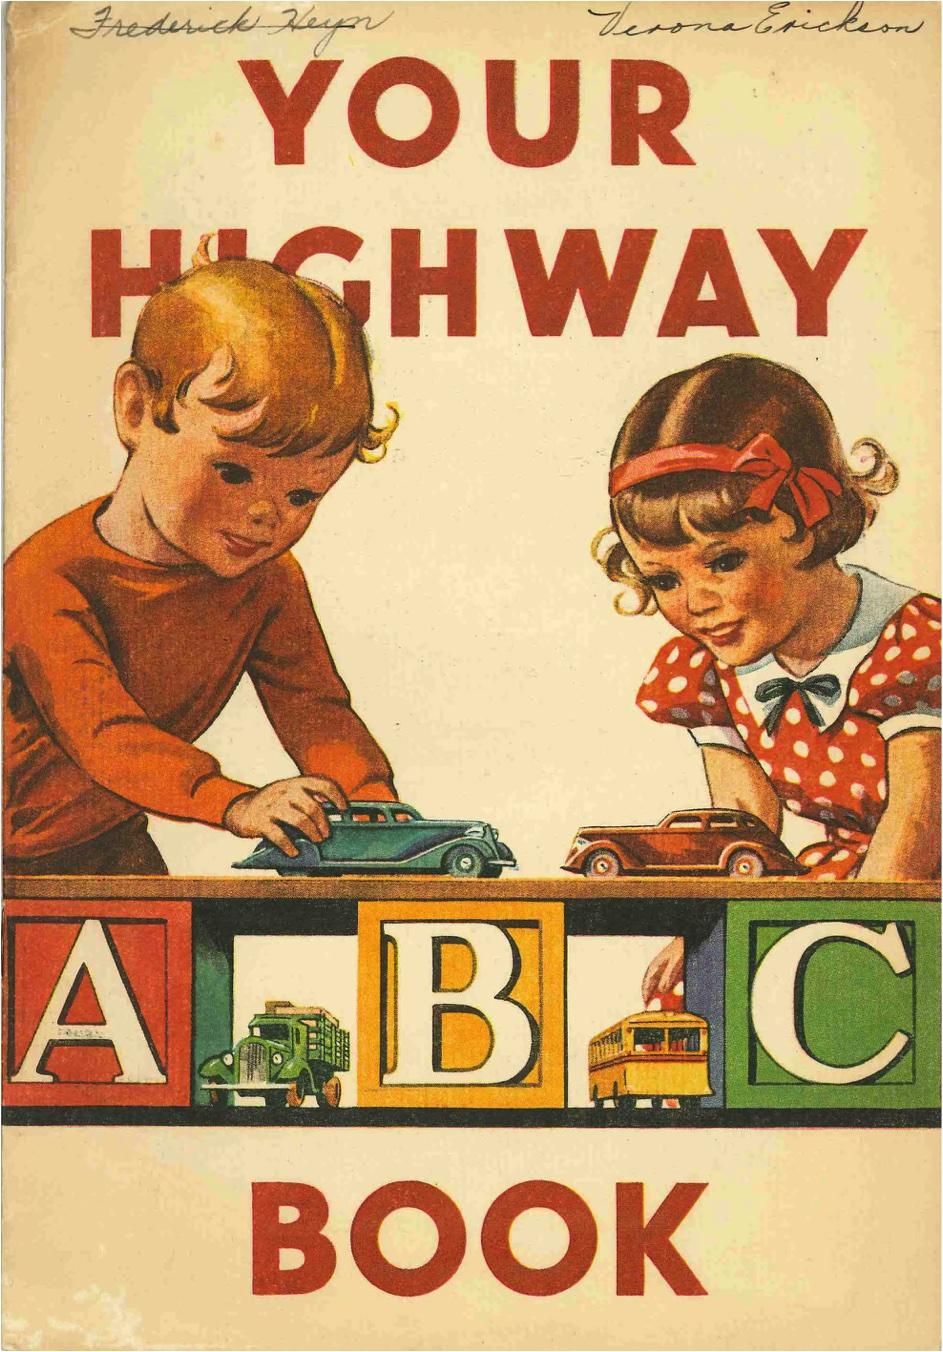 Highway-abcs copy.jpg